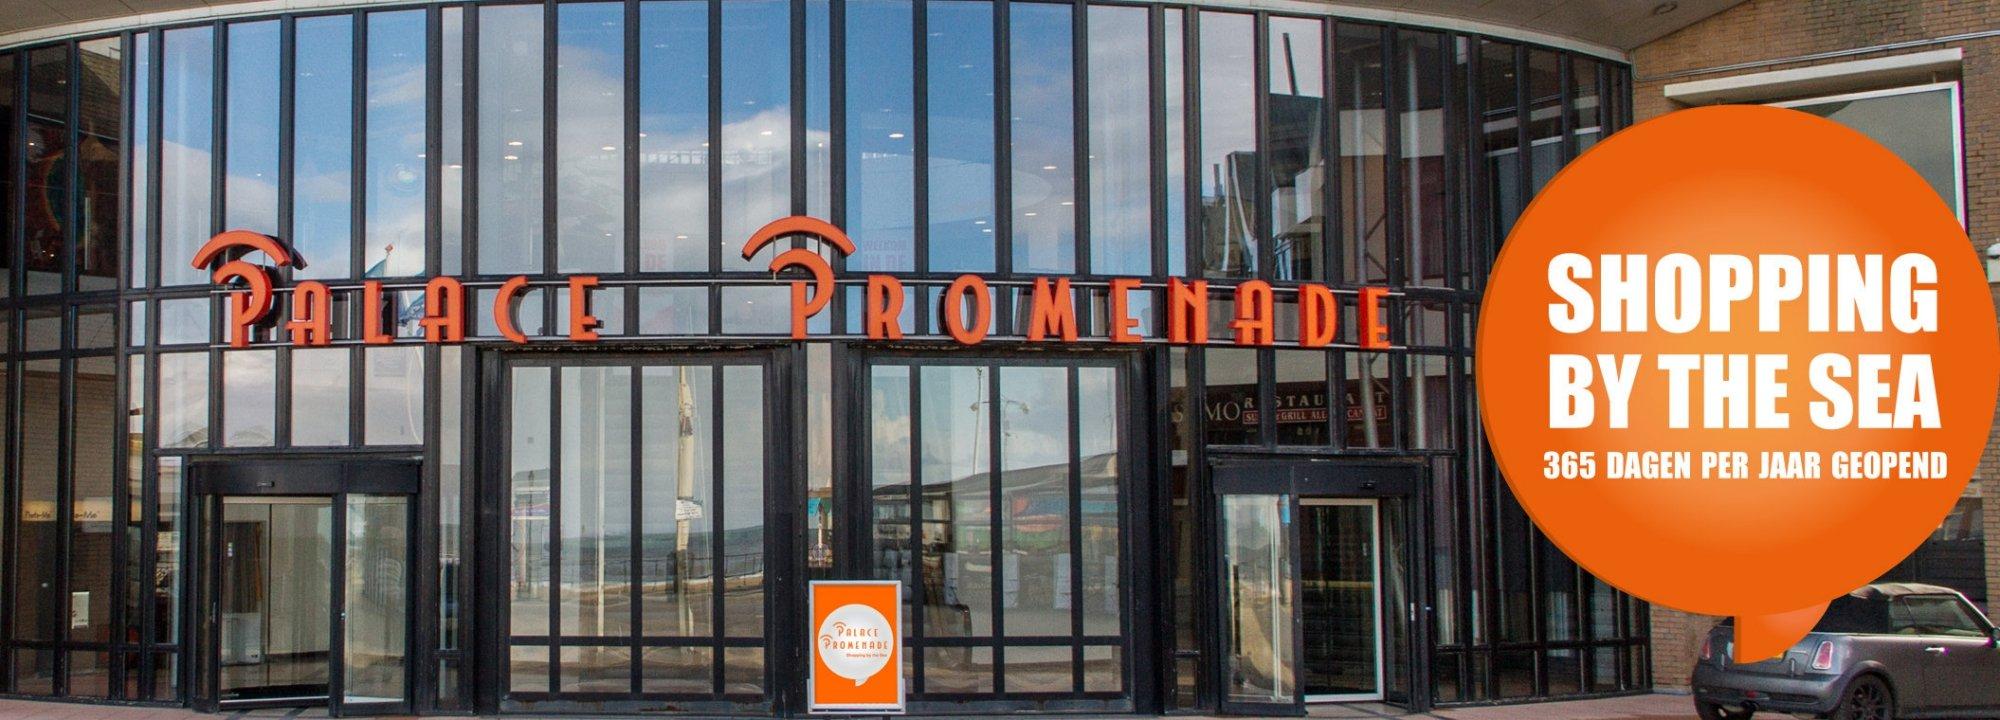 fe3cc29c422 Palace Promenade Scheveningen - Winkels